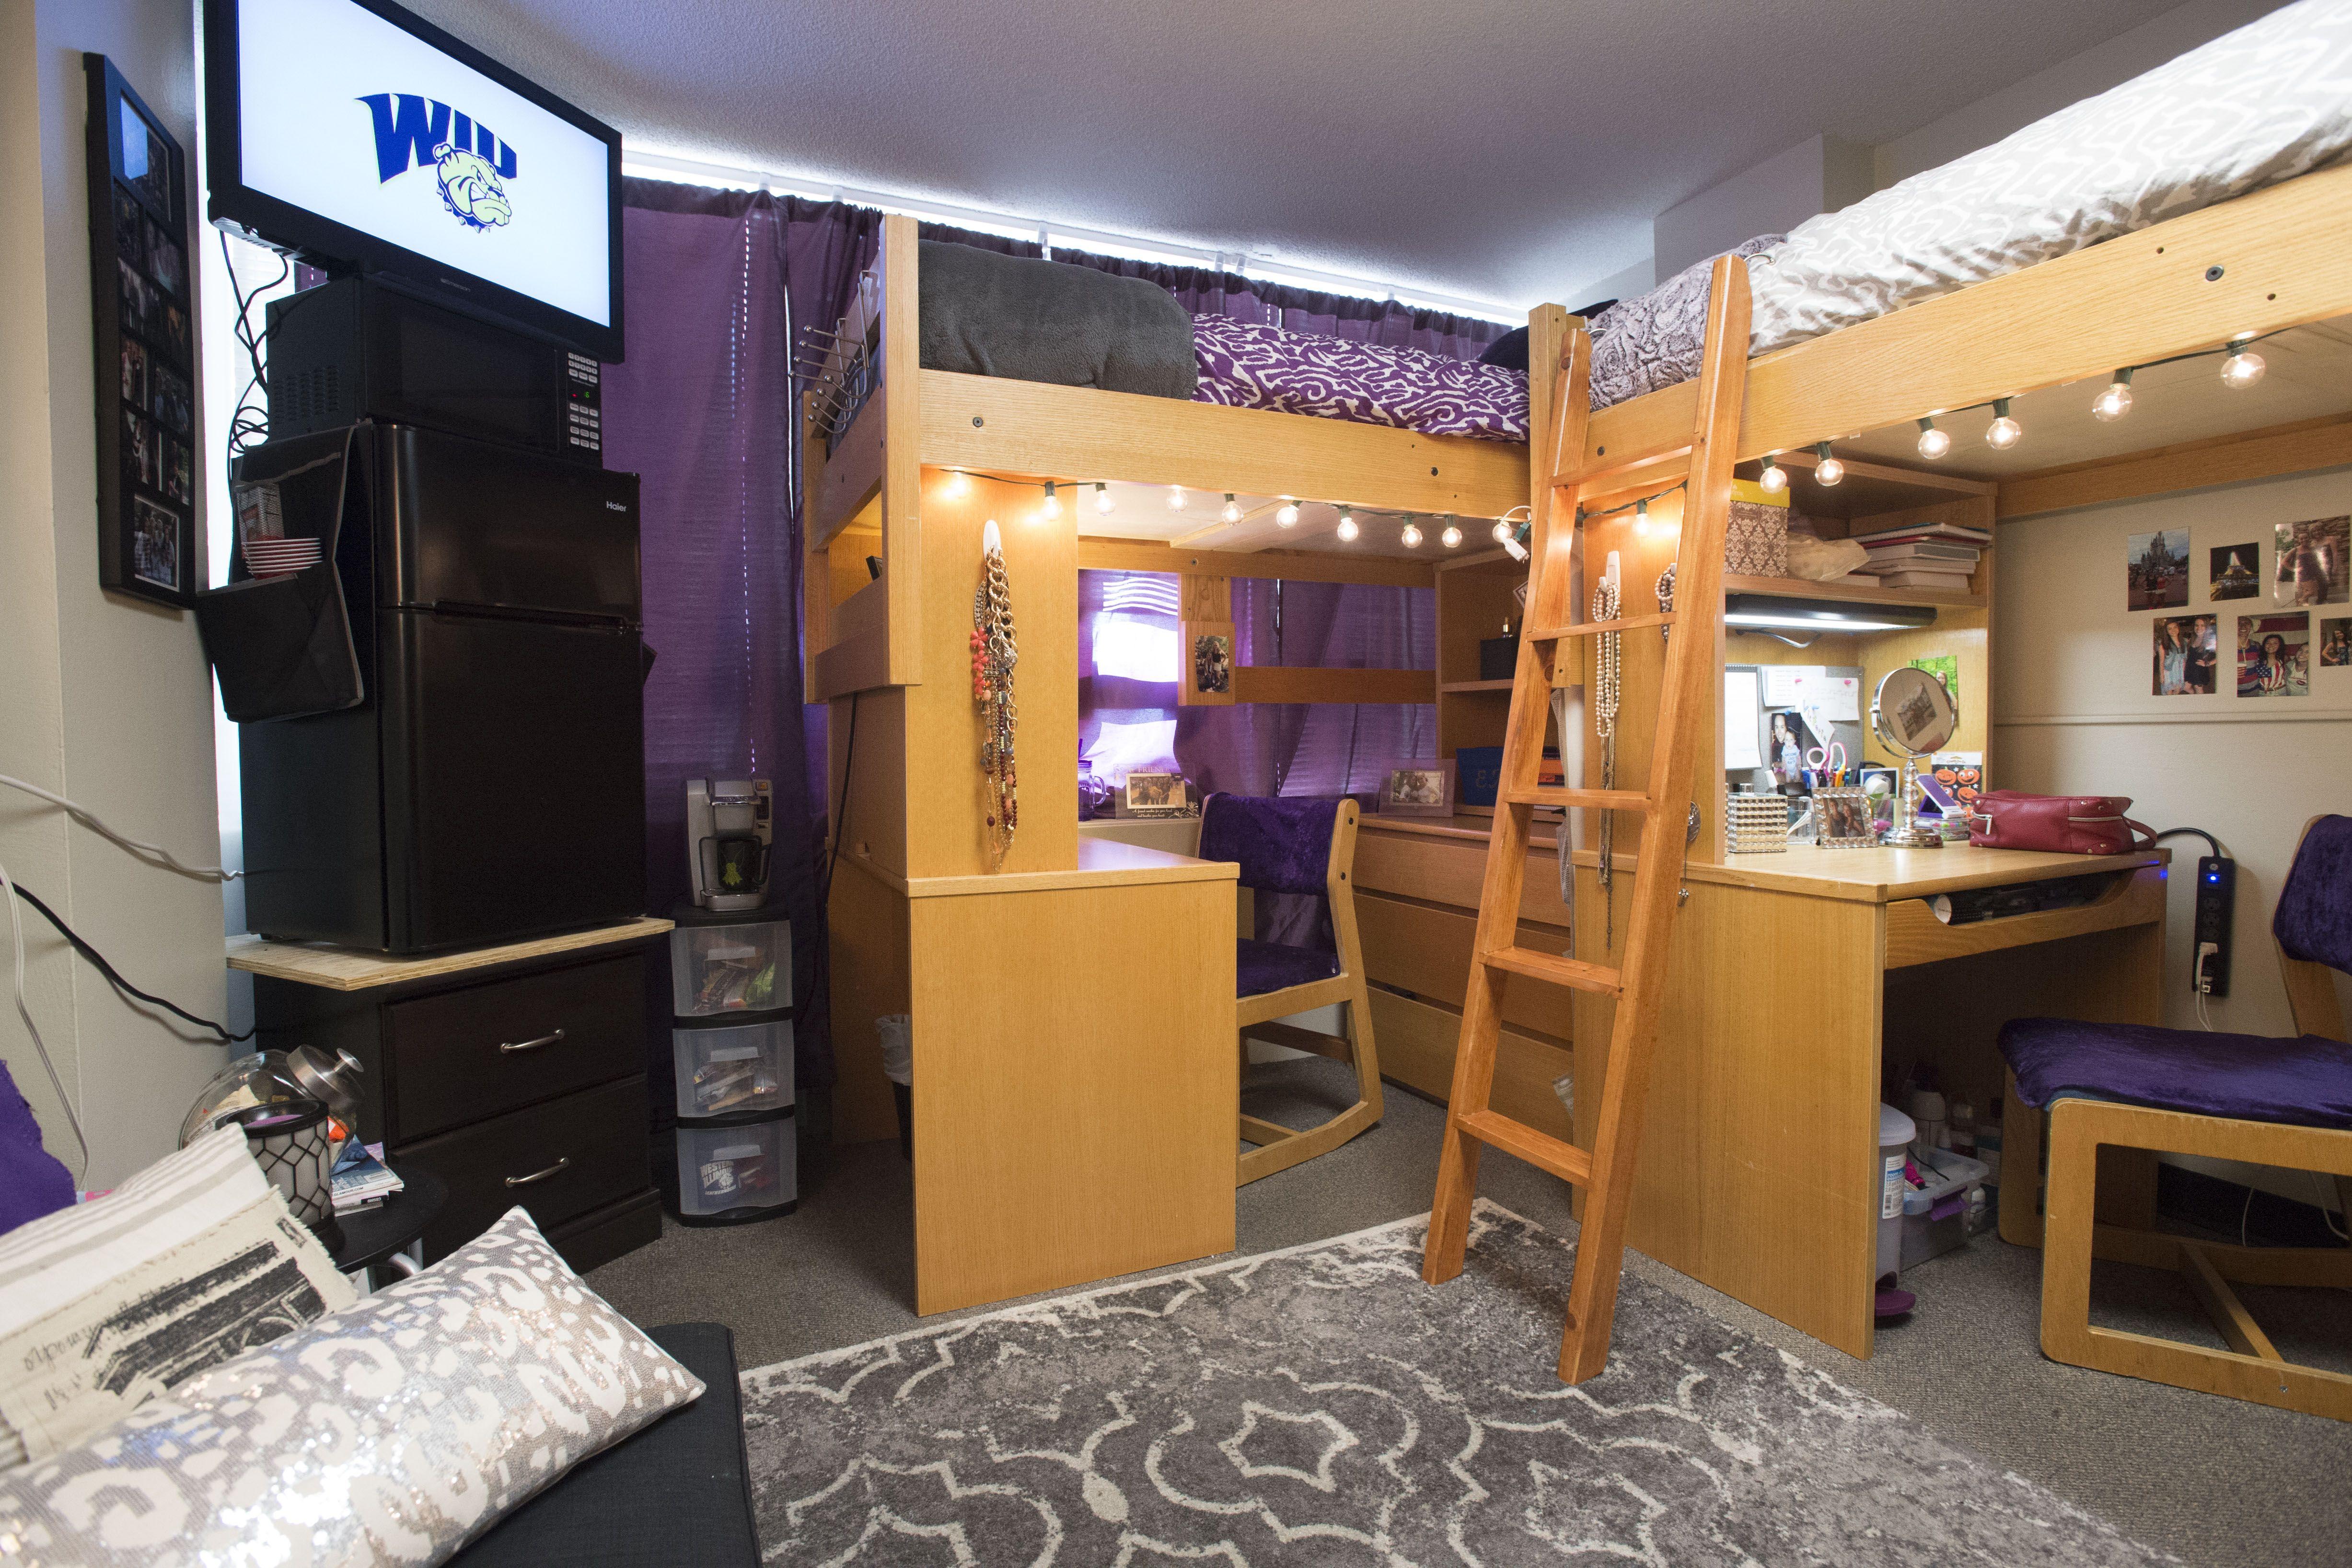 Charming Bayliss/Henninger Halls   Coolest Dorm Room Contest At Western Illinois  University! #WIU Part 13